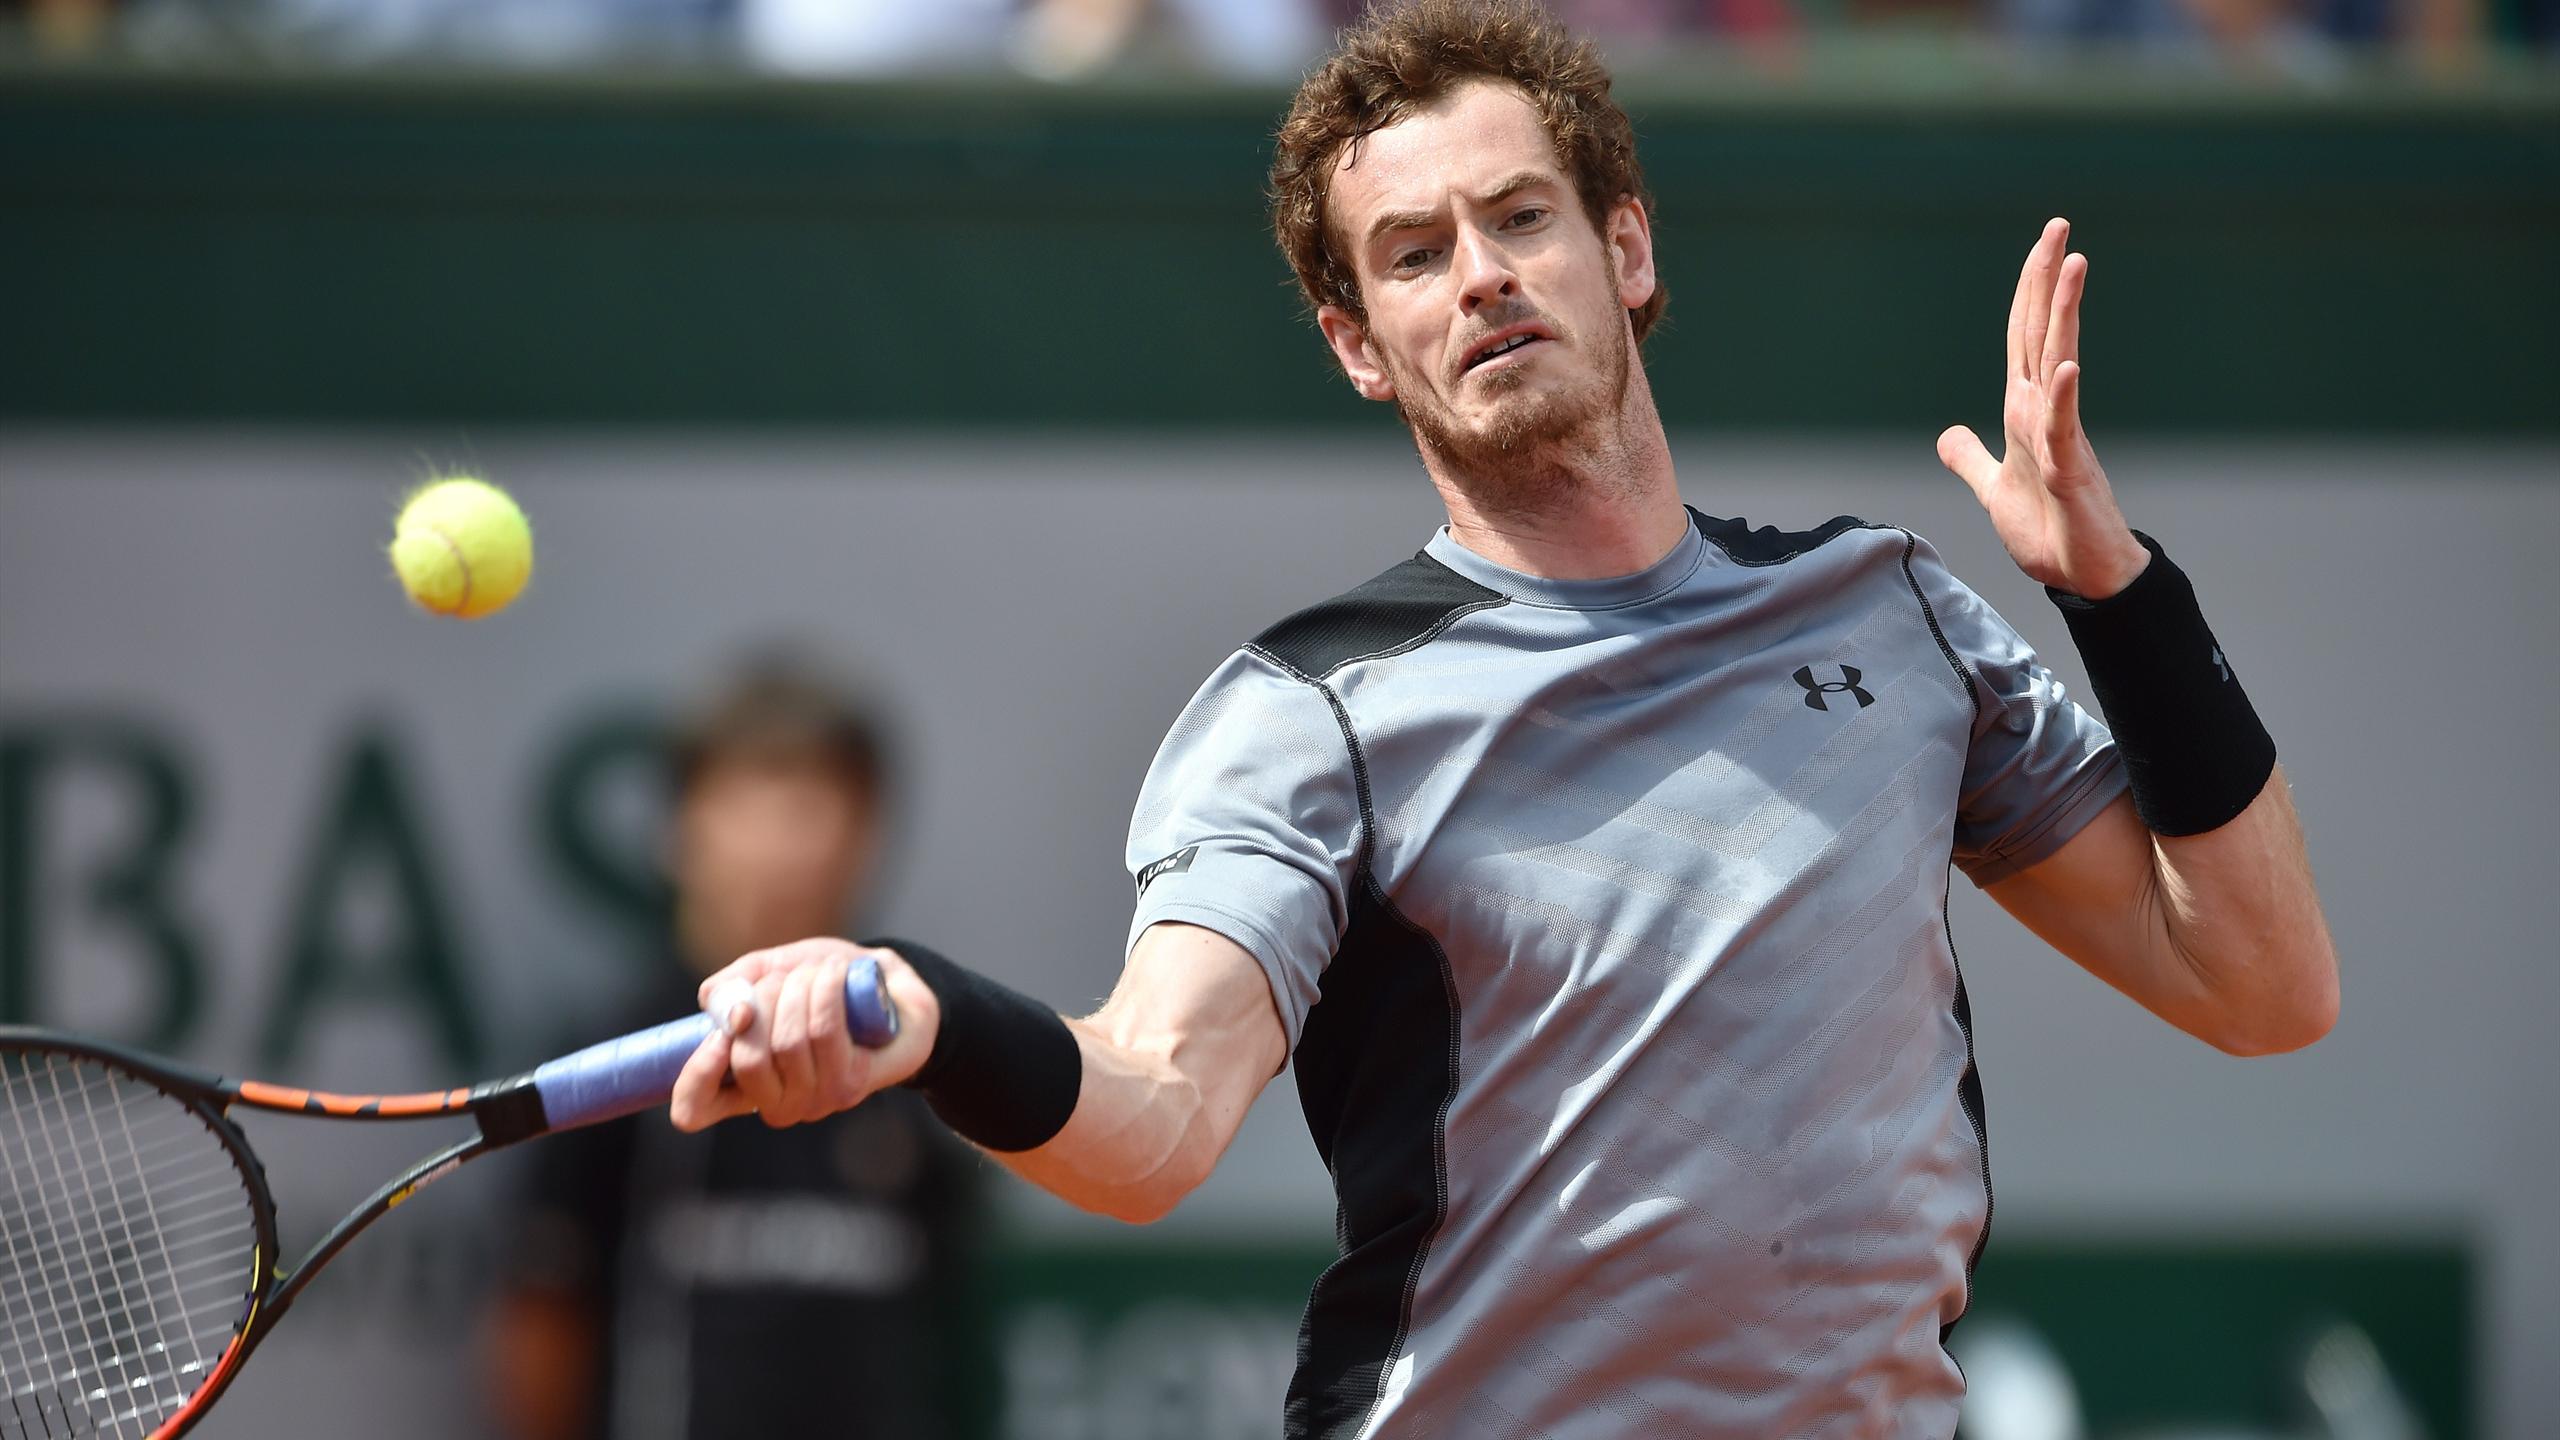 Andy Murray vs Nick Kyrgios during Roland Garros 2015 on May 30, 2015